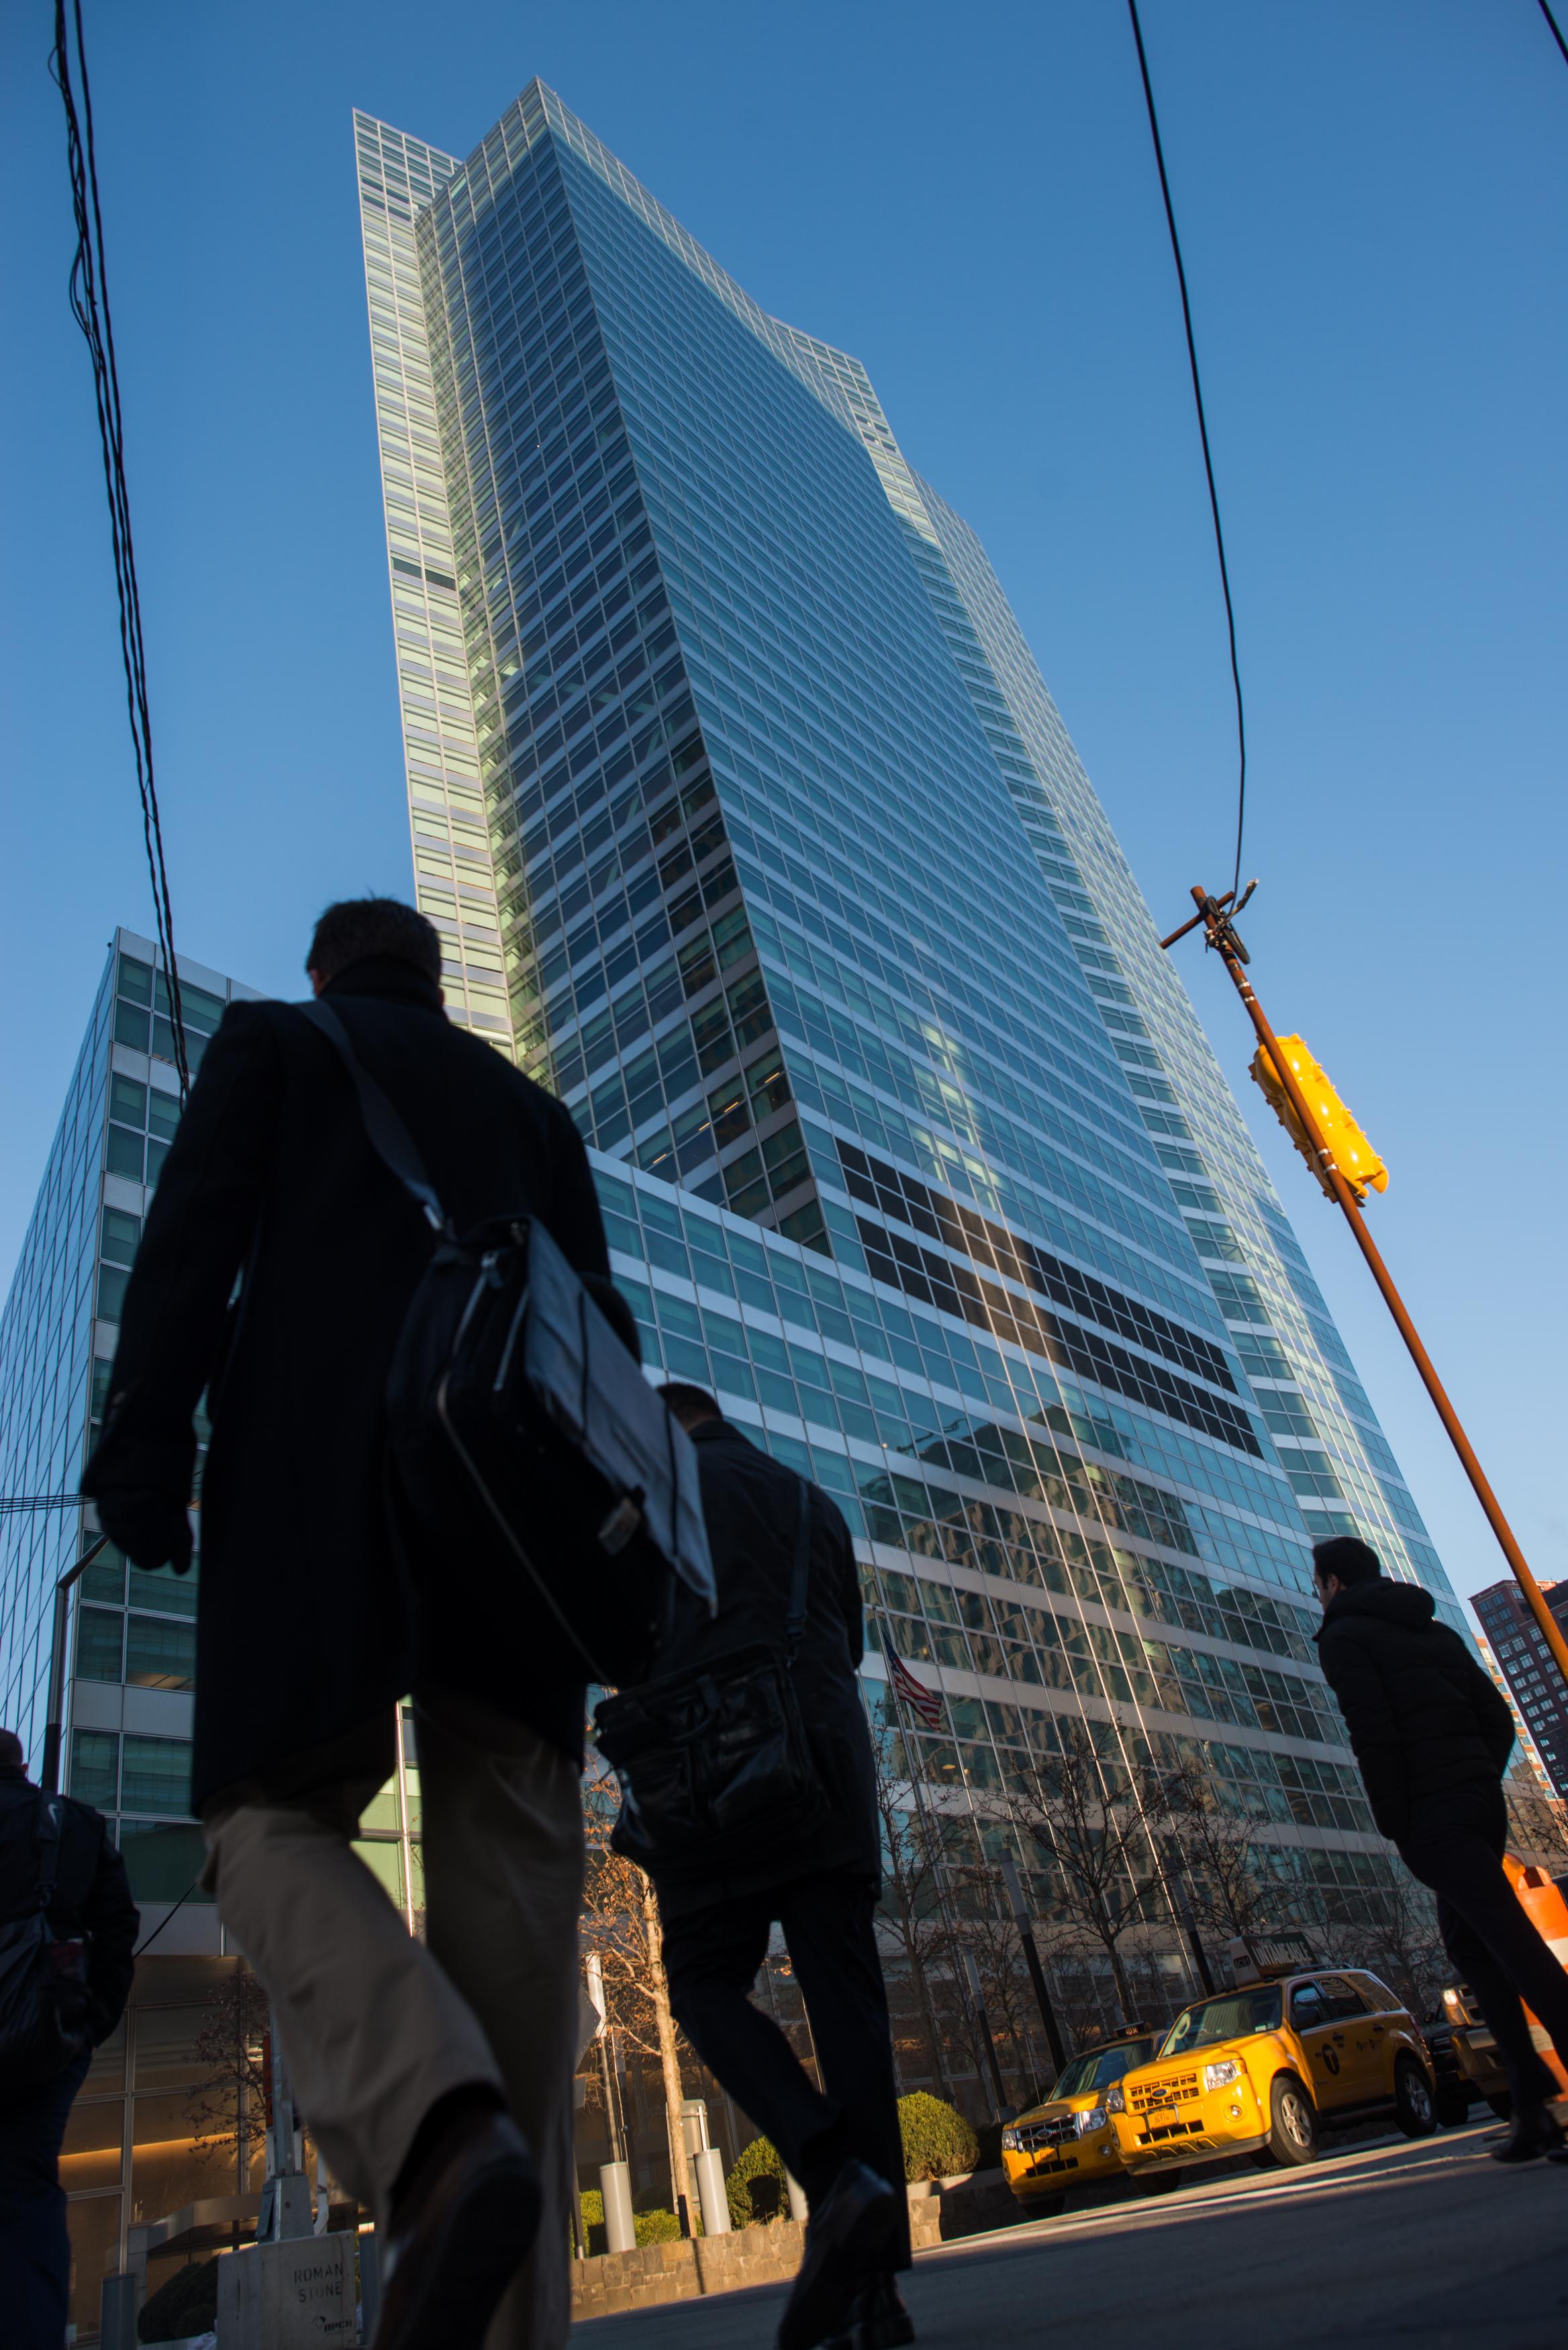 Views Of Goldman Sachs Group Headquarters Ahead of Earnings